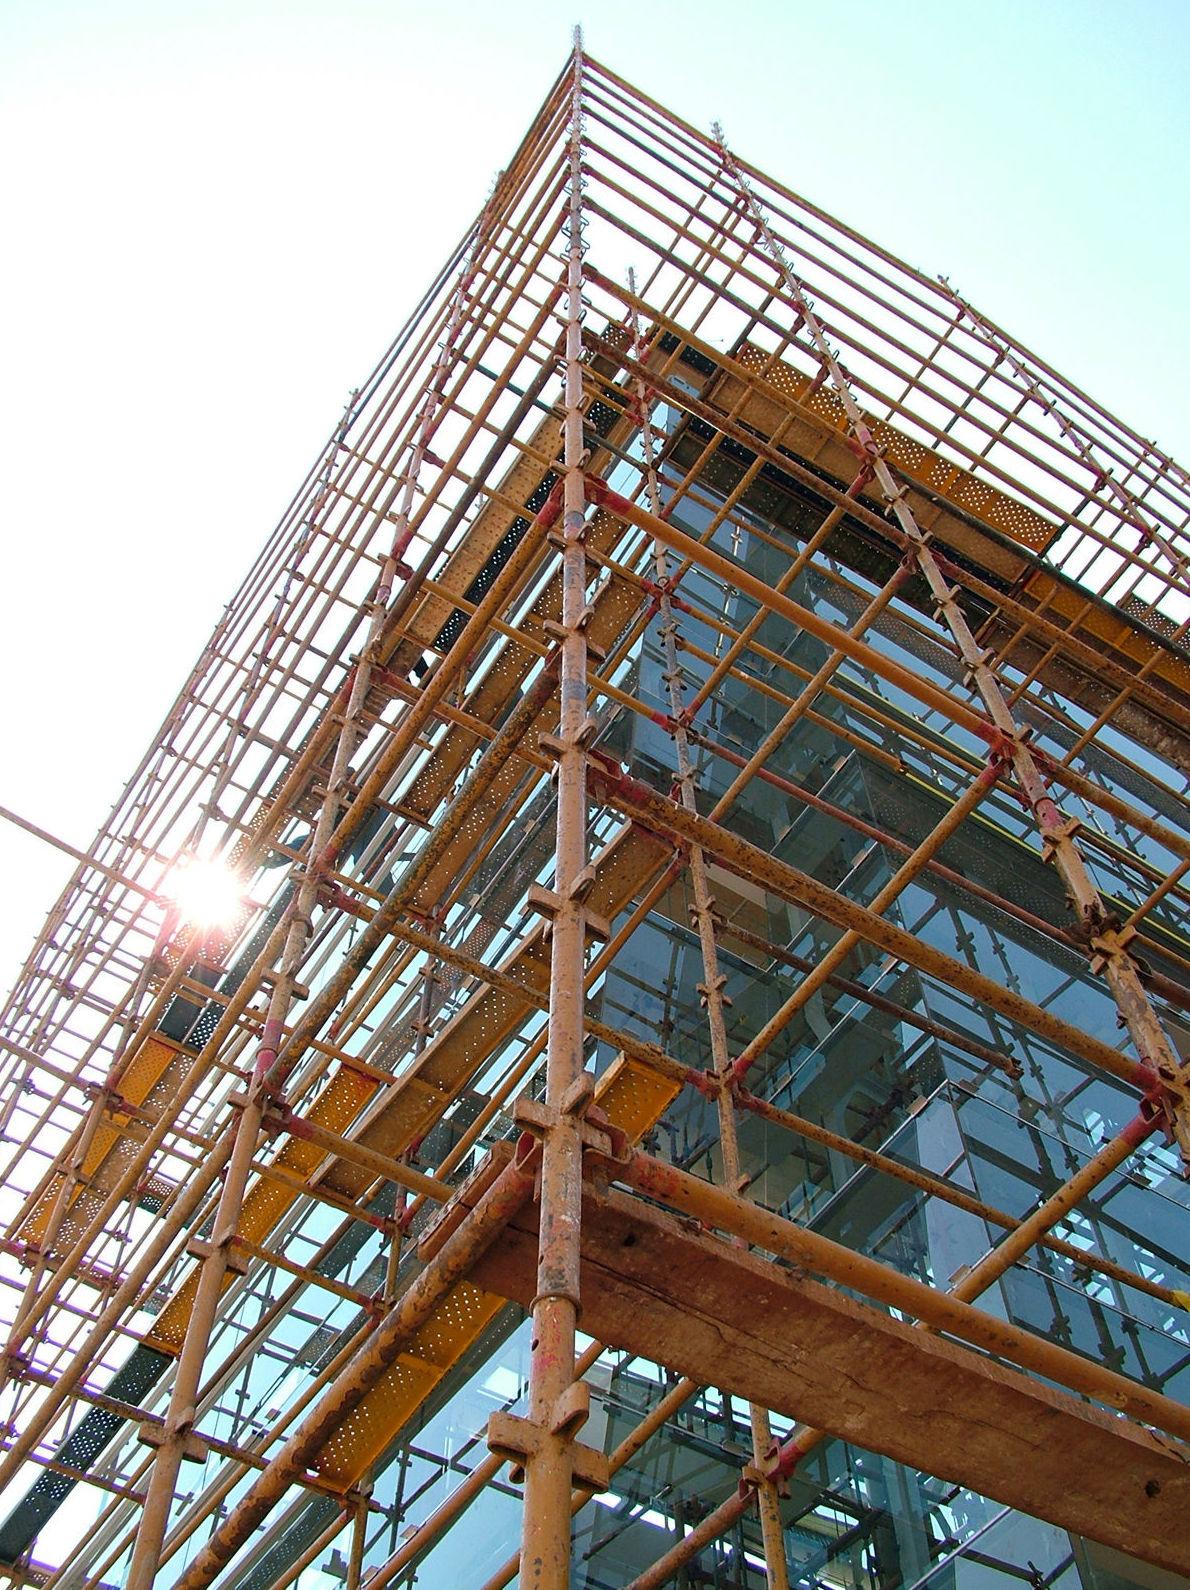 Inspección técnica de edificios en Huelva